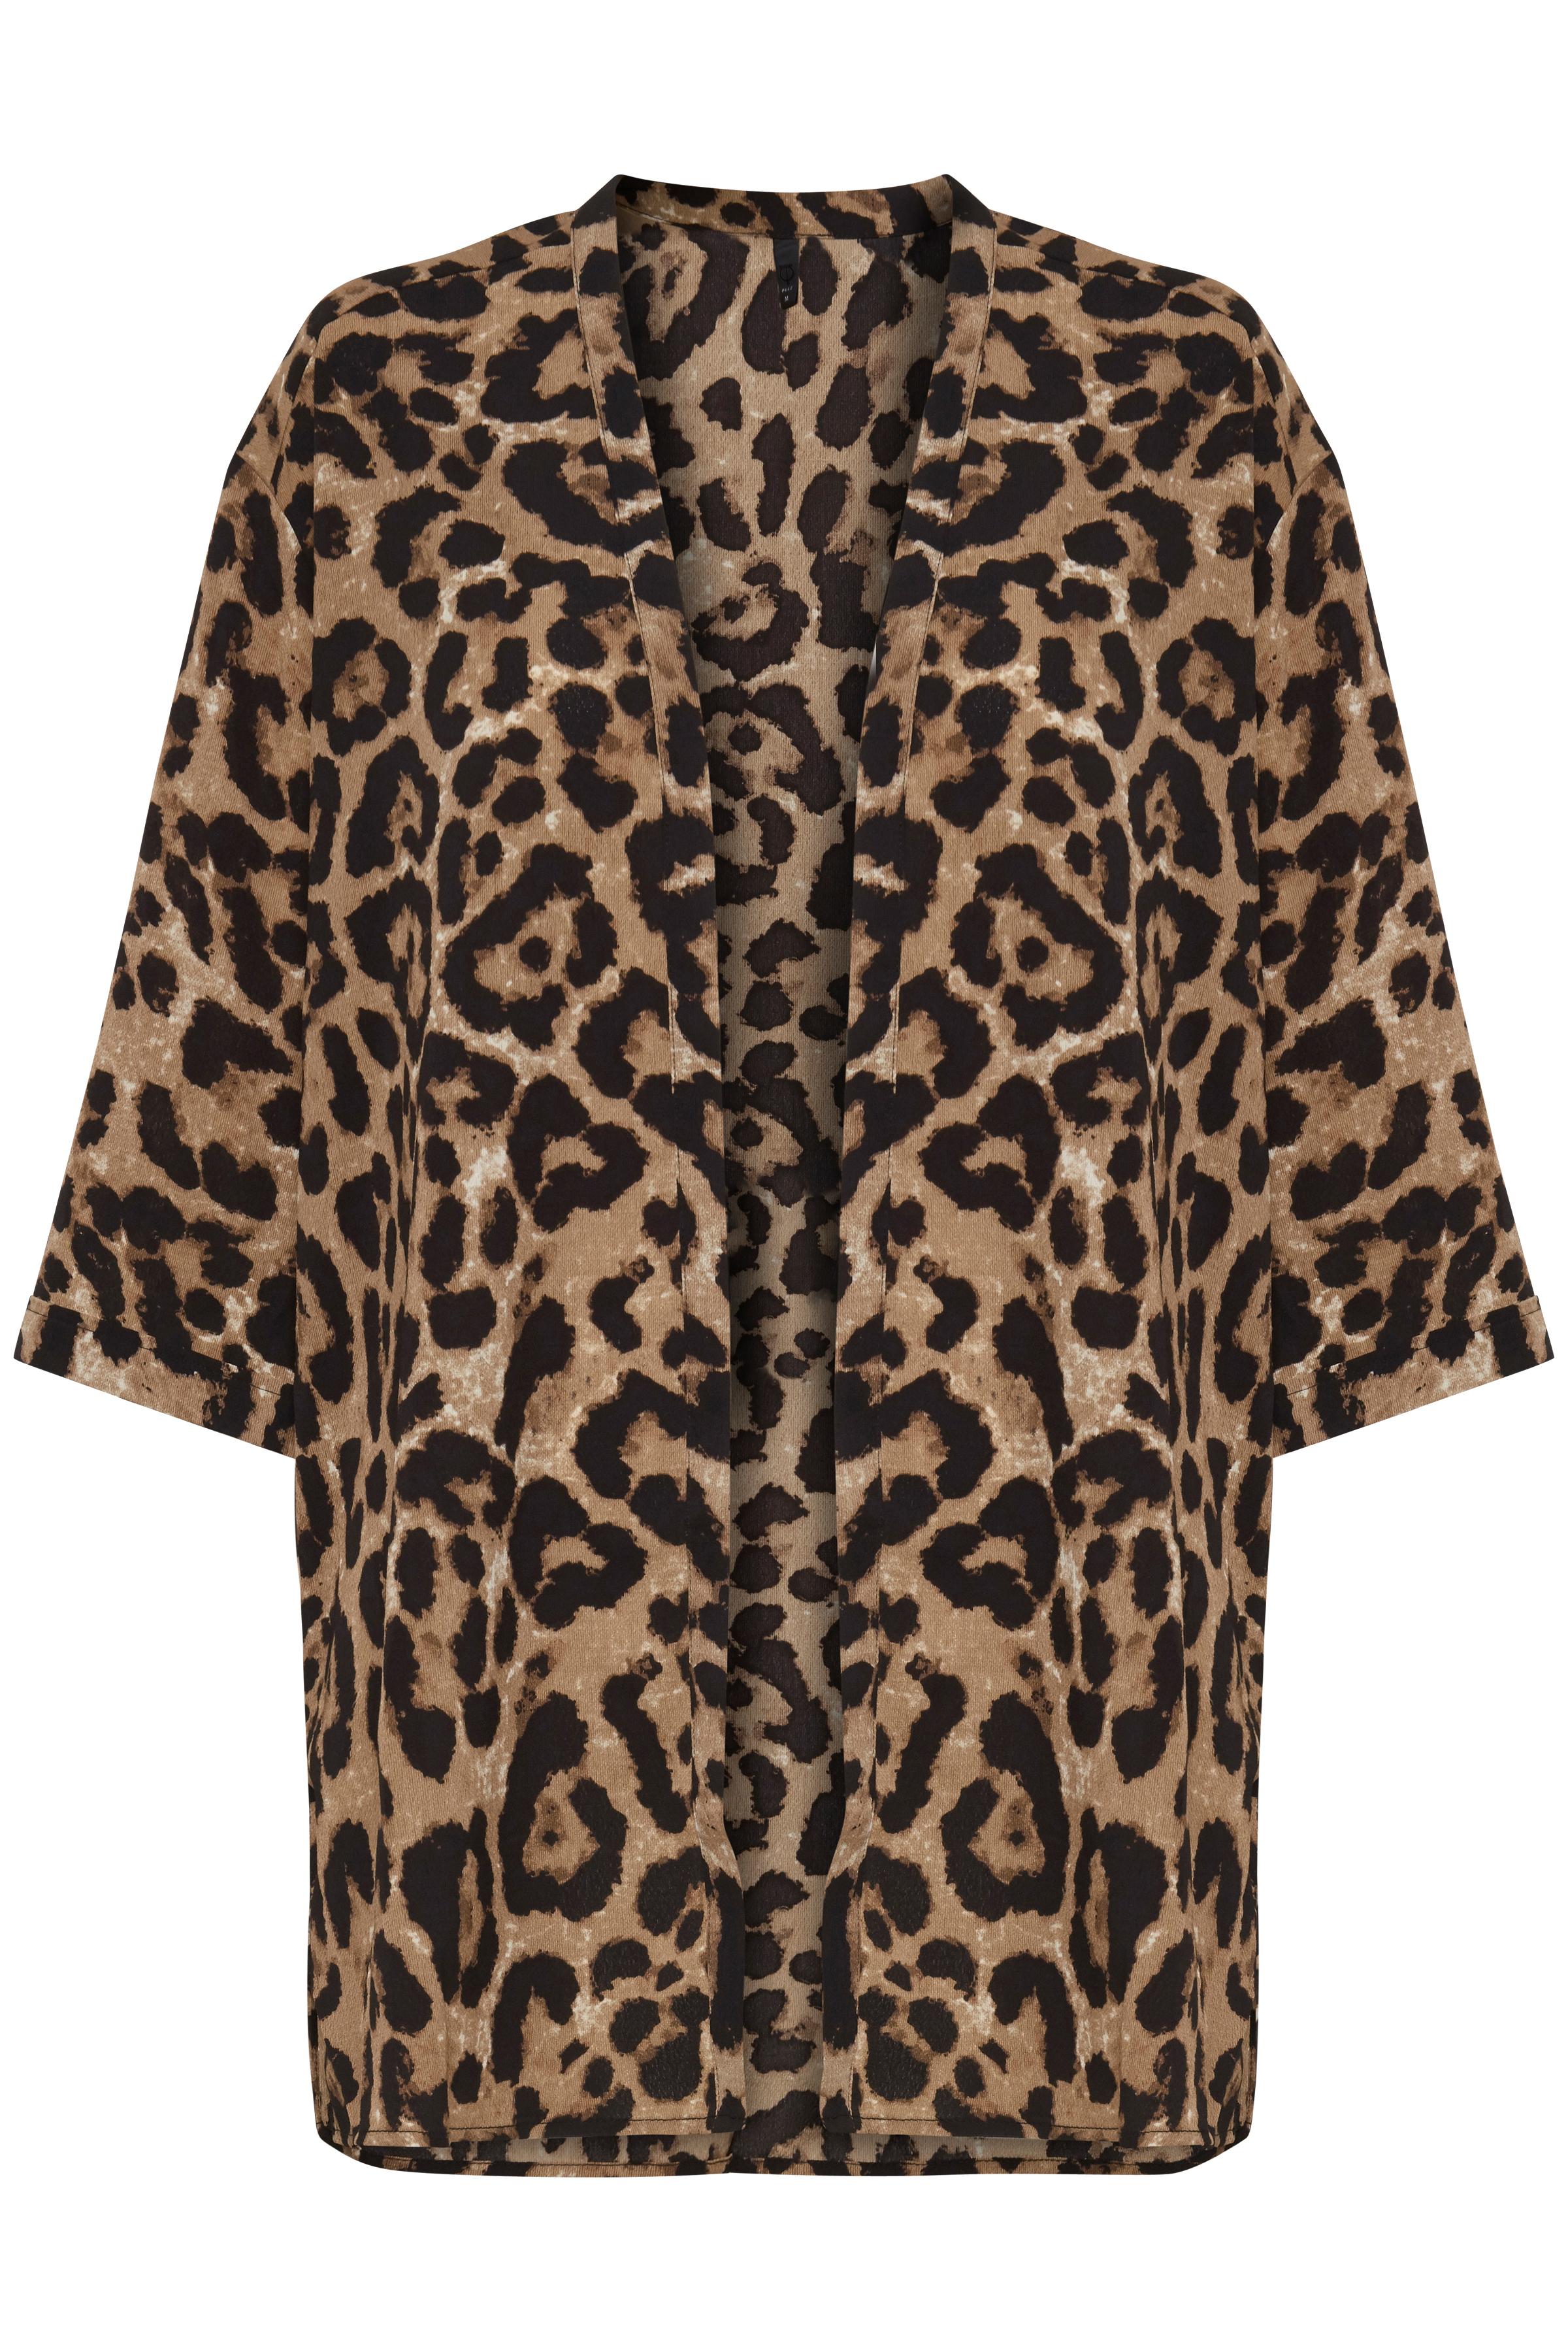 Leopard Sand print